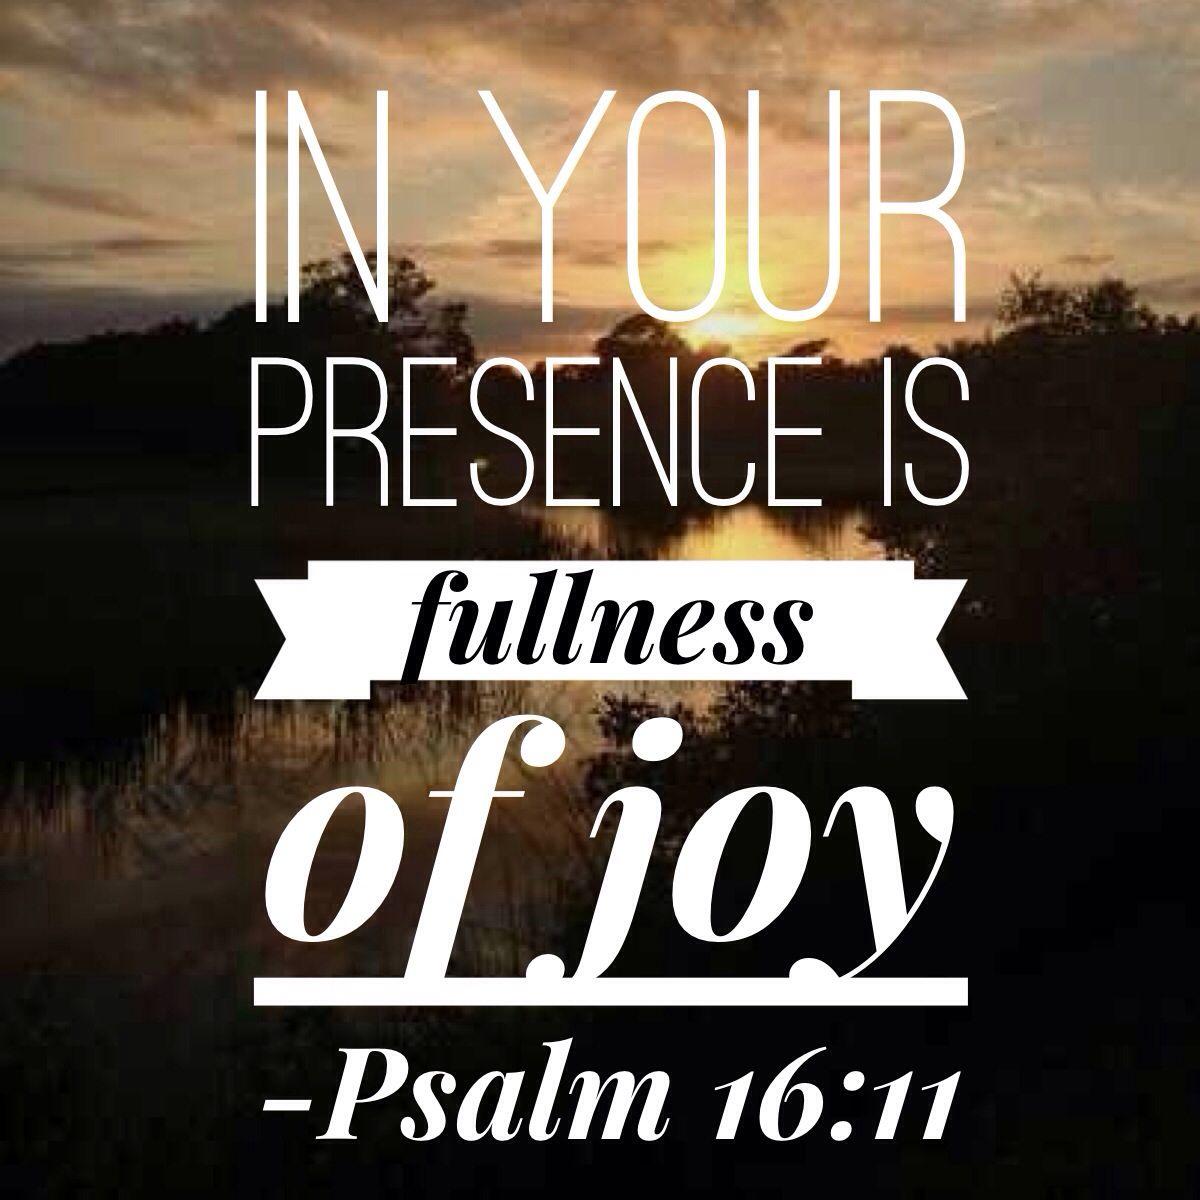 fullnessofjoy psalm 16 11 god s word